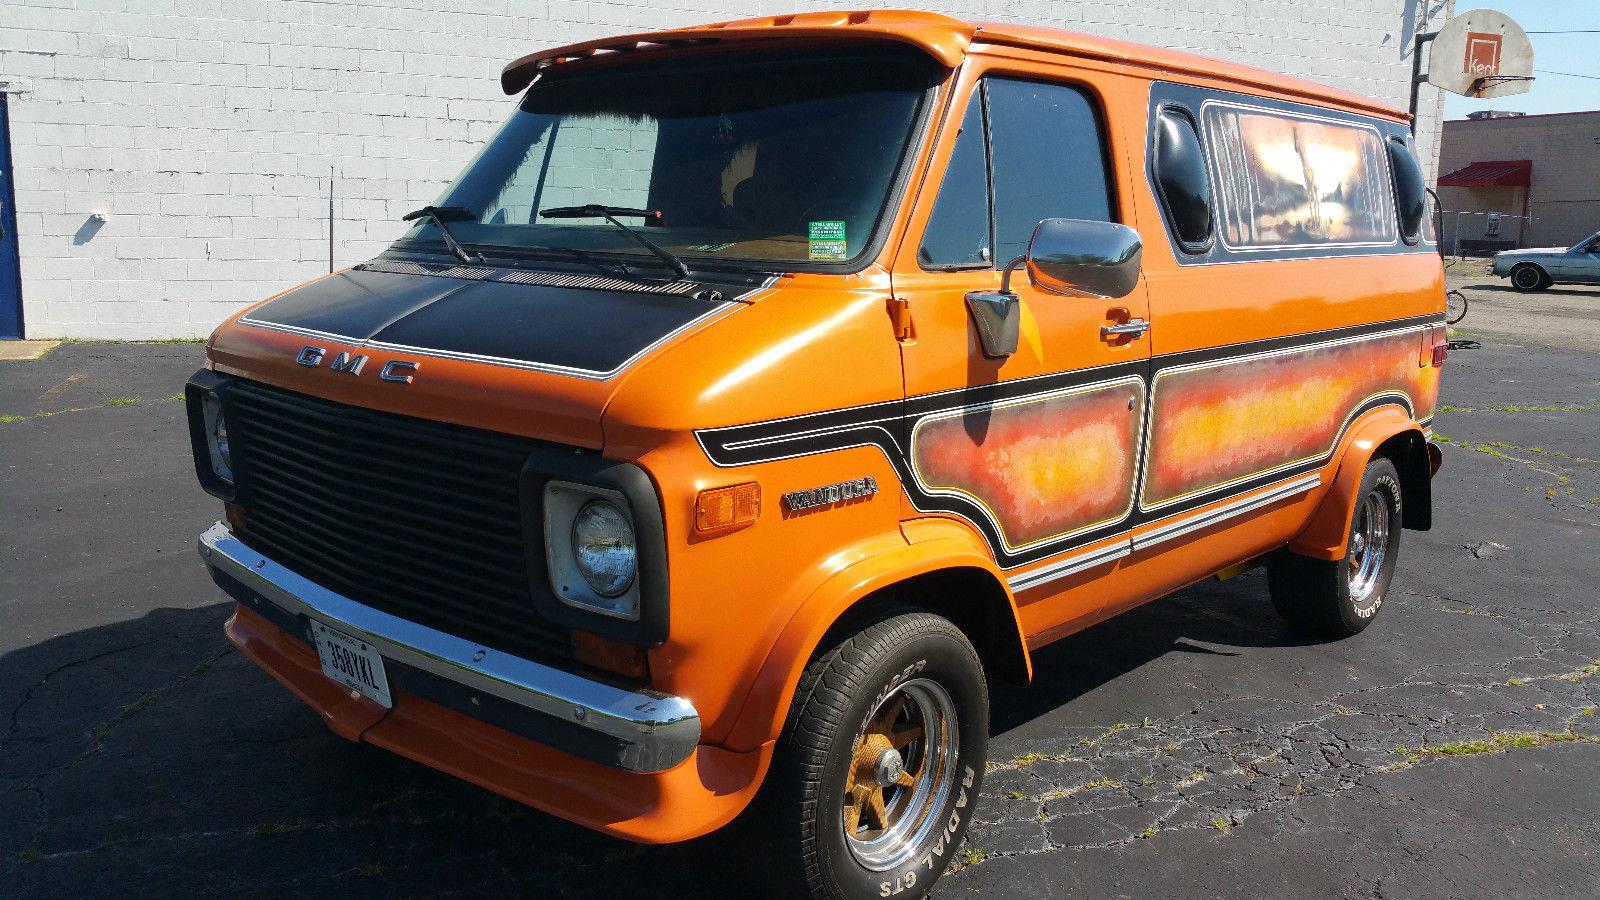 conversion gmc prevnext handi truck van vans camper news flashbacks trend historic front